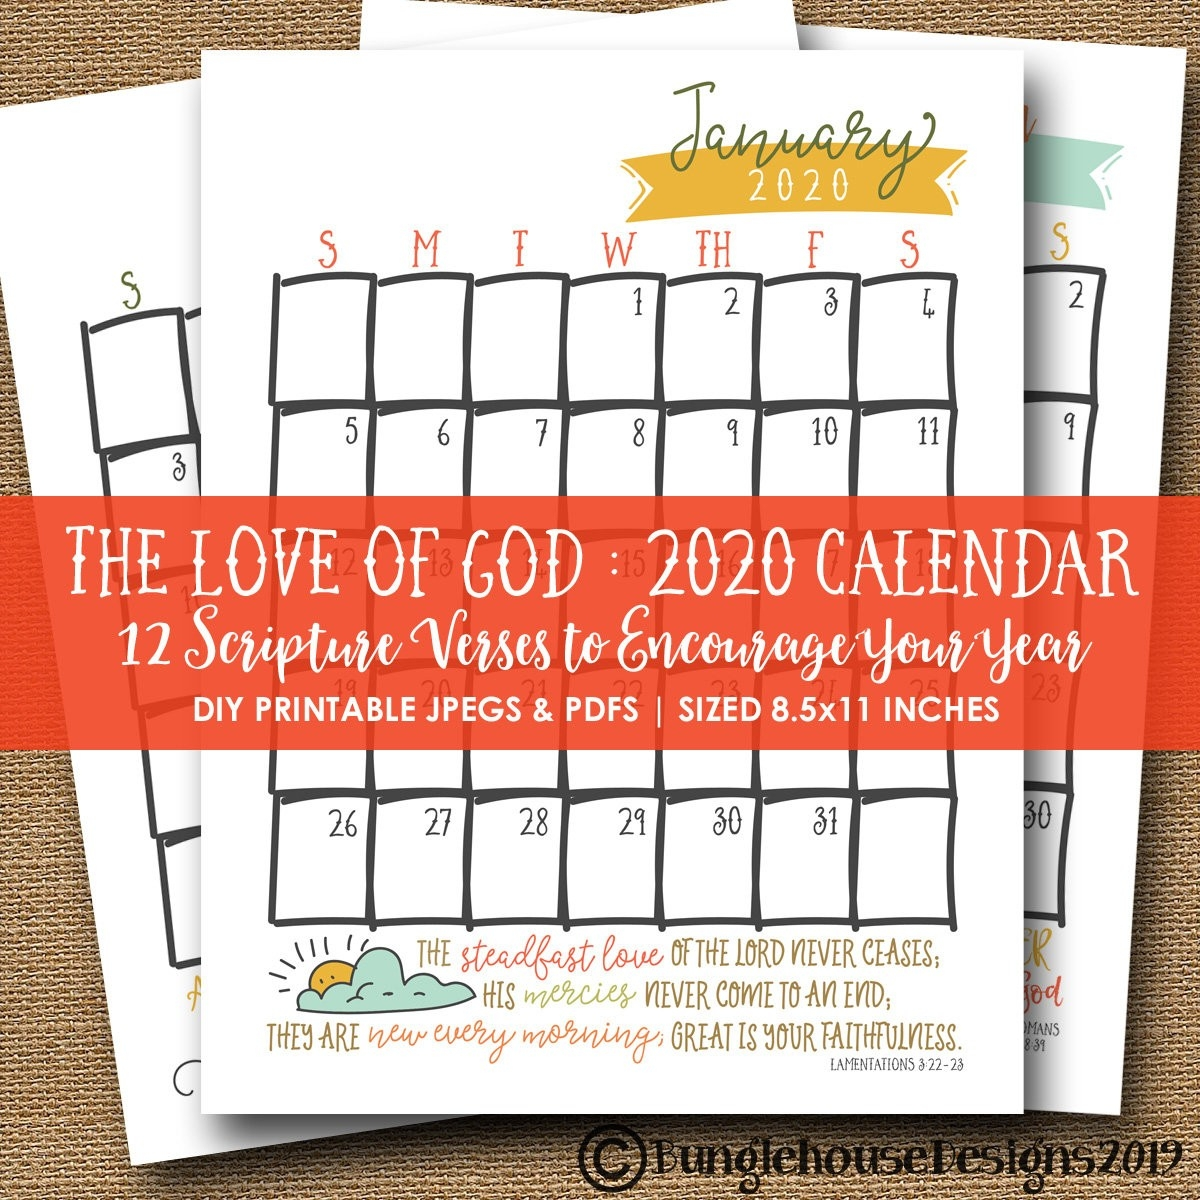 2020 Printable Calendar | Scripture, Bible Verse 2020 Calendar | Instant  Download Printable Calendar For 2020 Planner | Christian Calendar  Printable Calendar 2020 With Scriptures